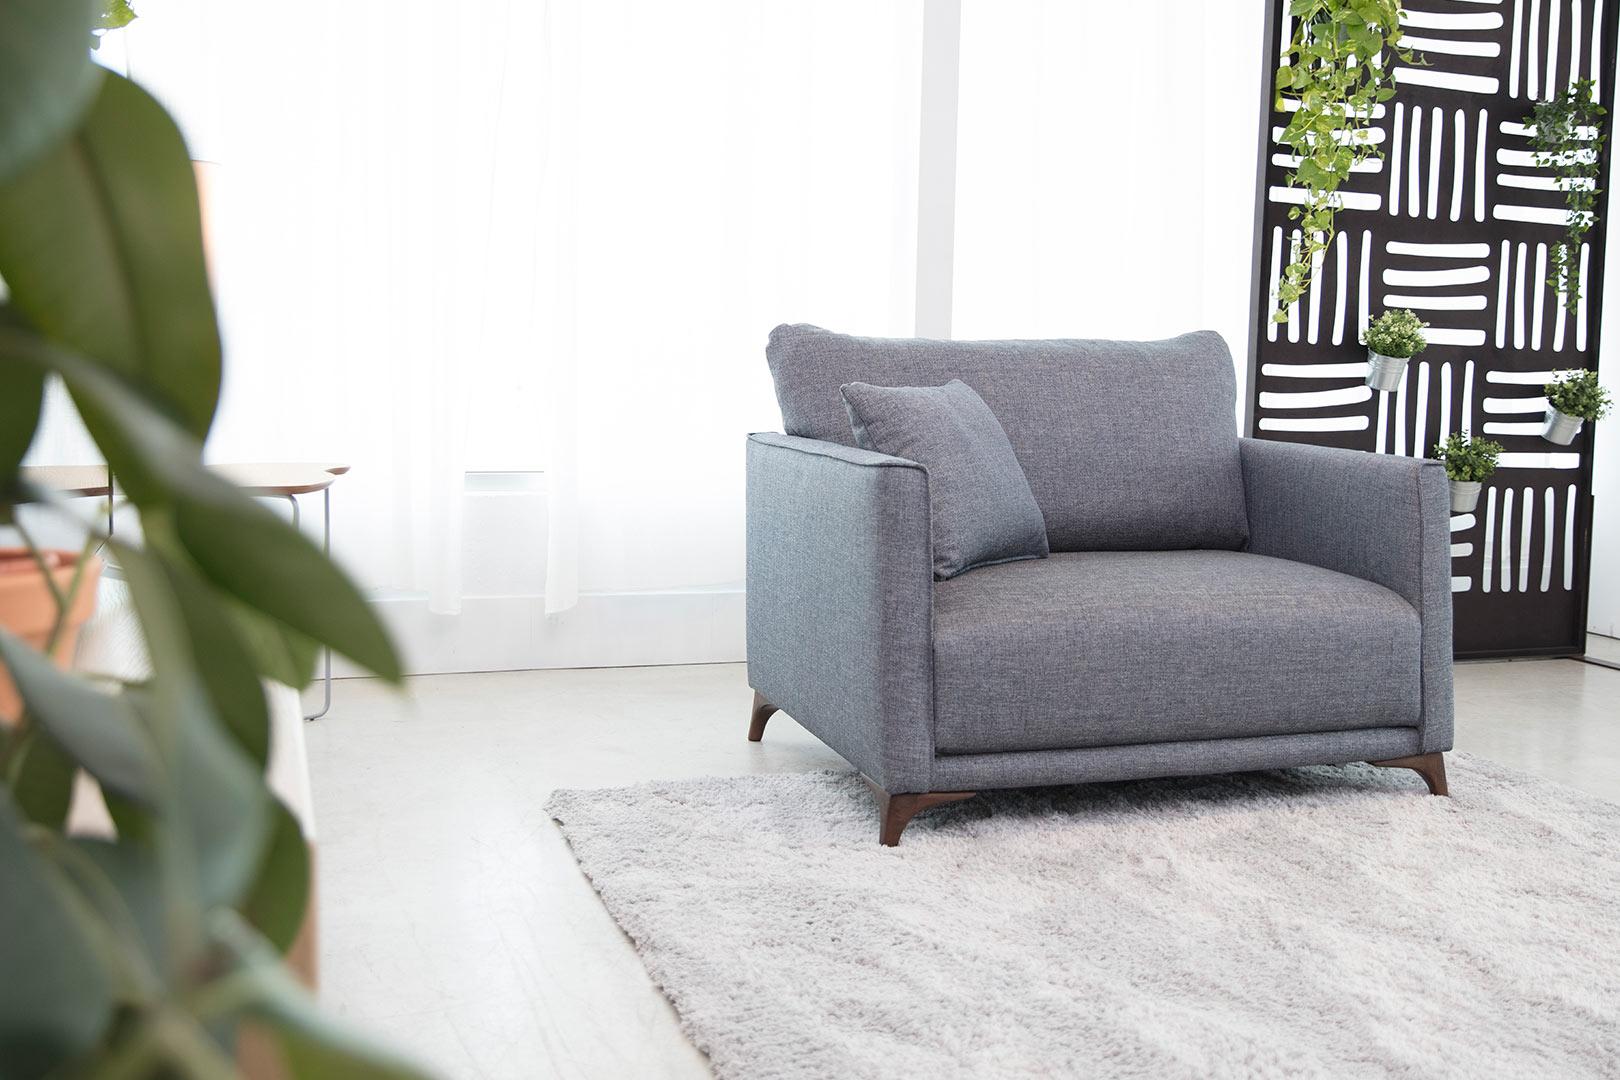 Dali sillón cama 2020 01